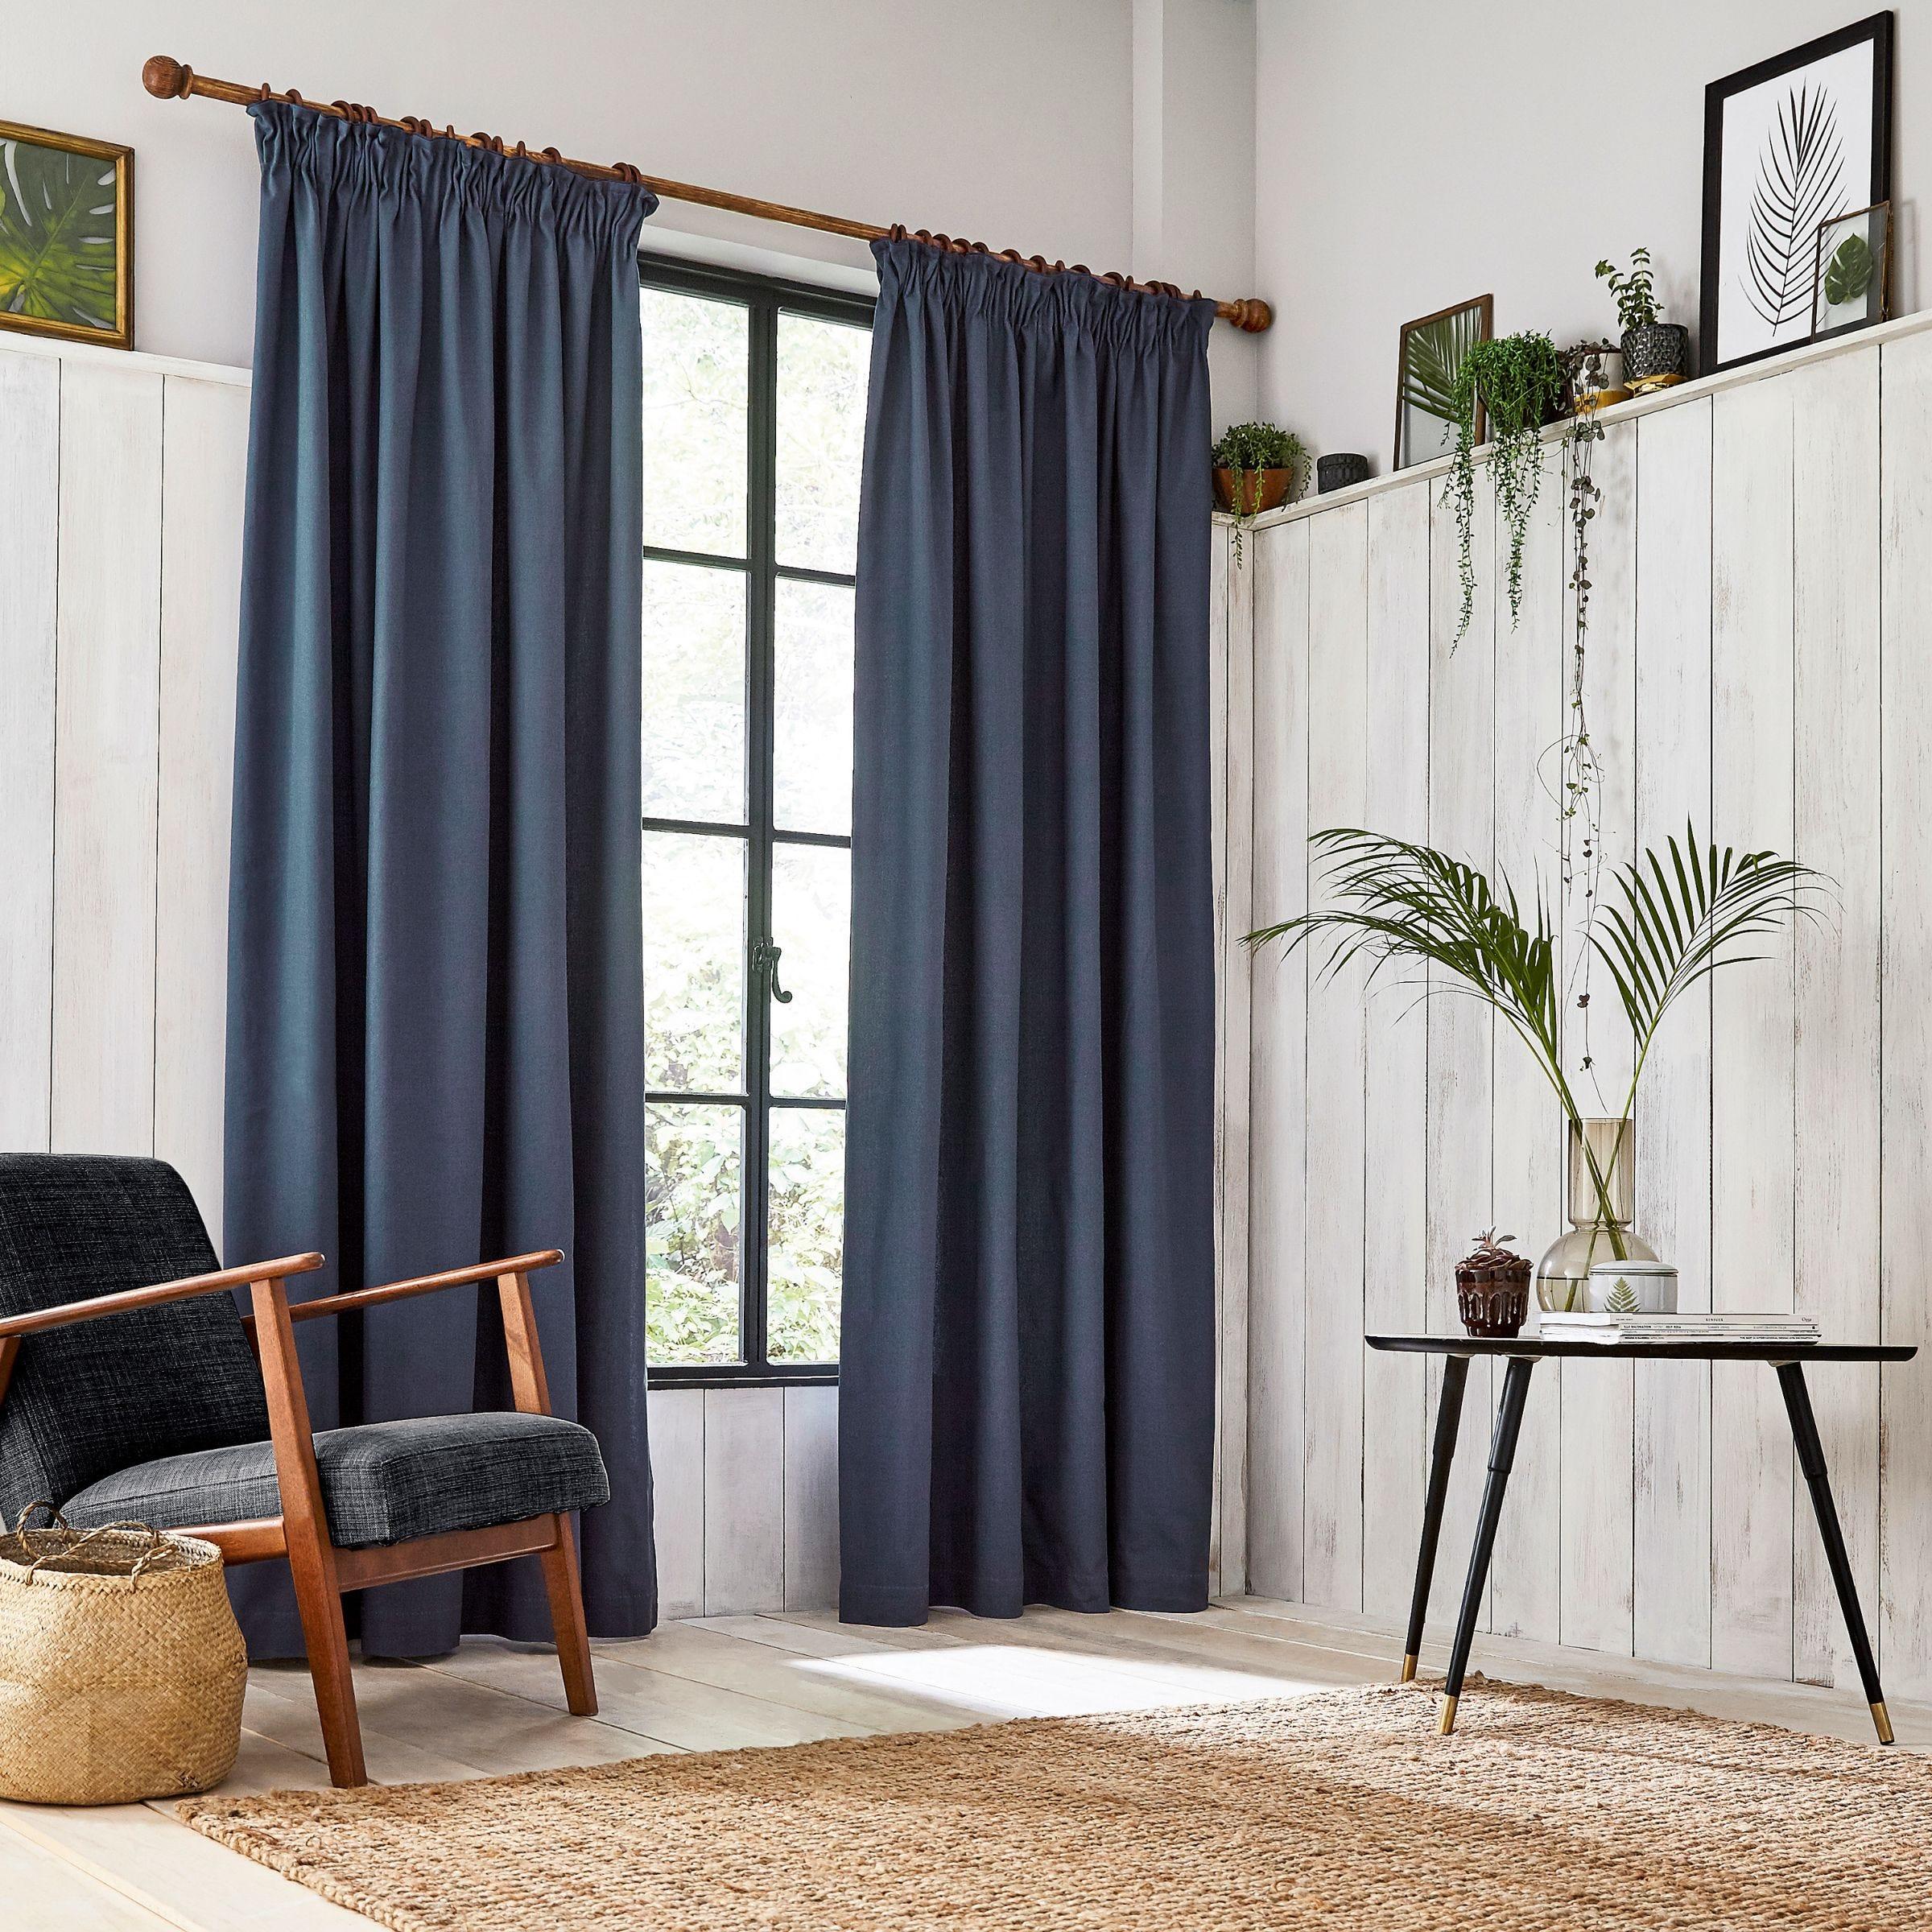 "Clarissa Hulse Chroma Lined Curtains 90"" x 72"", Dark Blue"